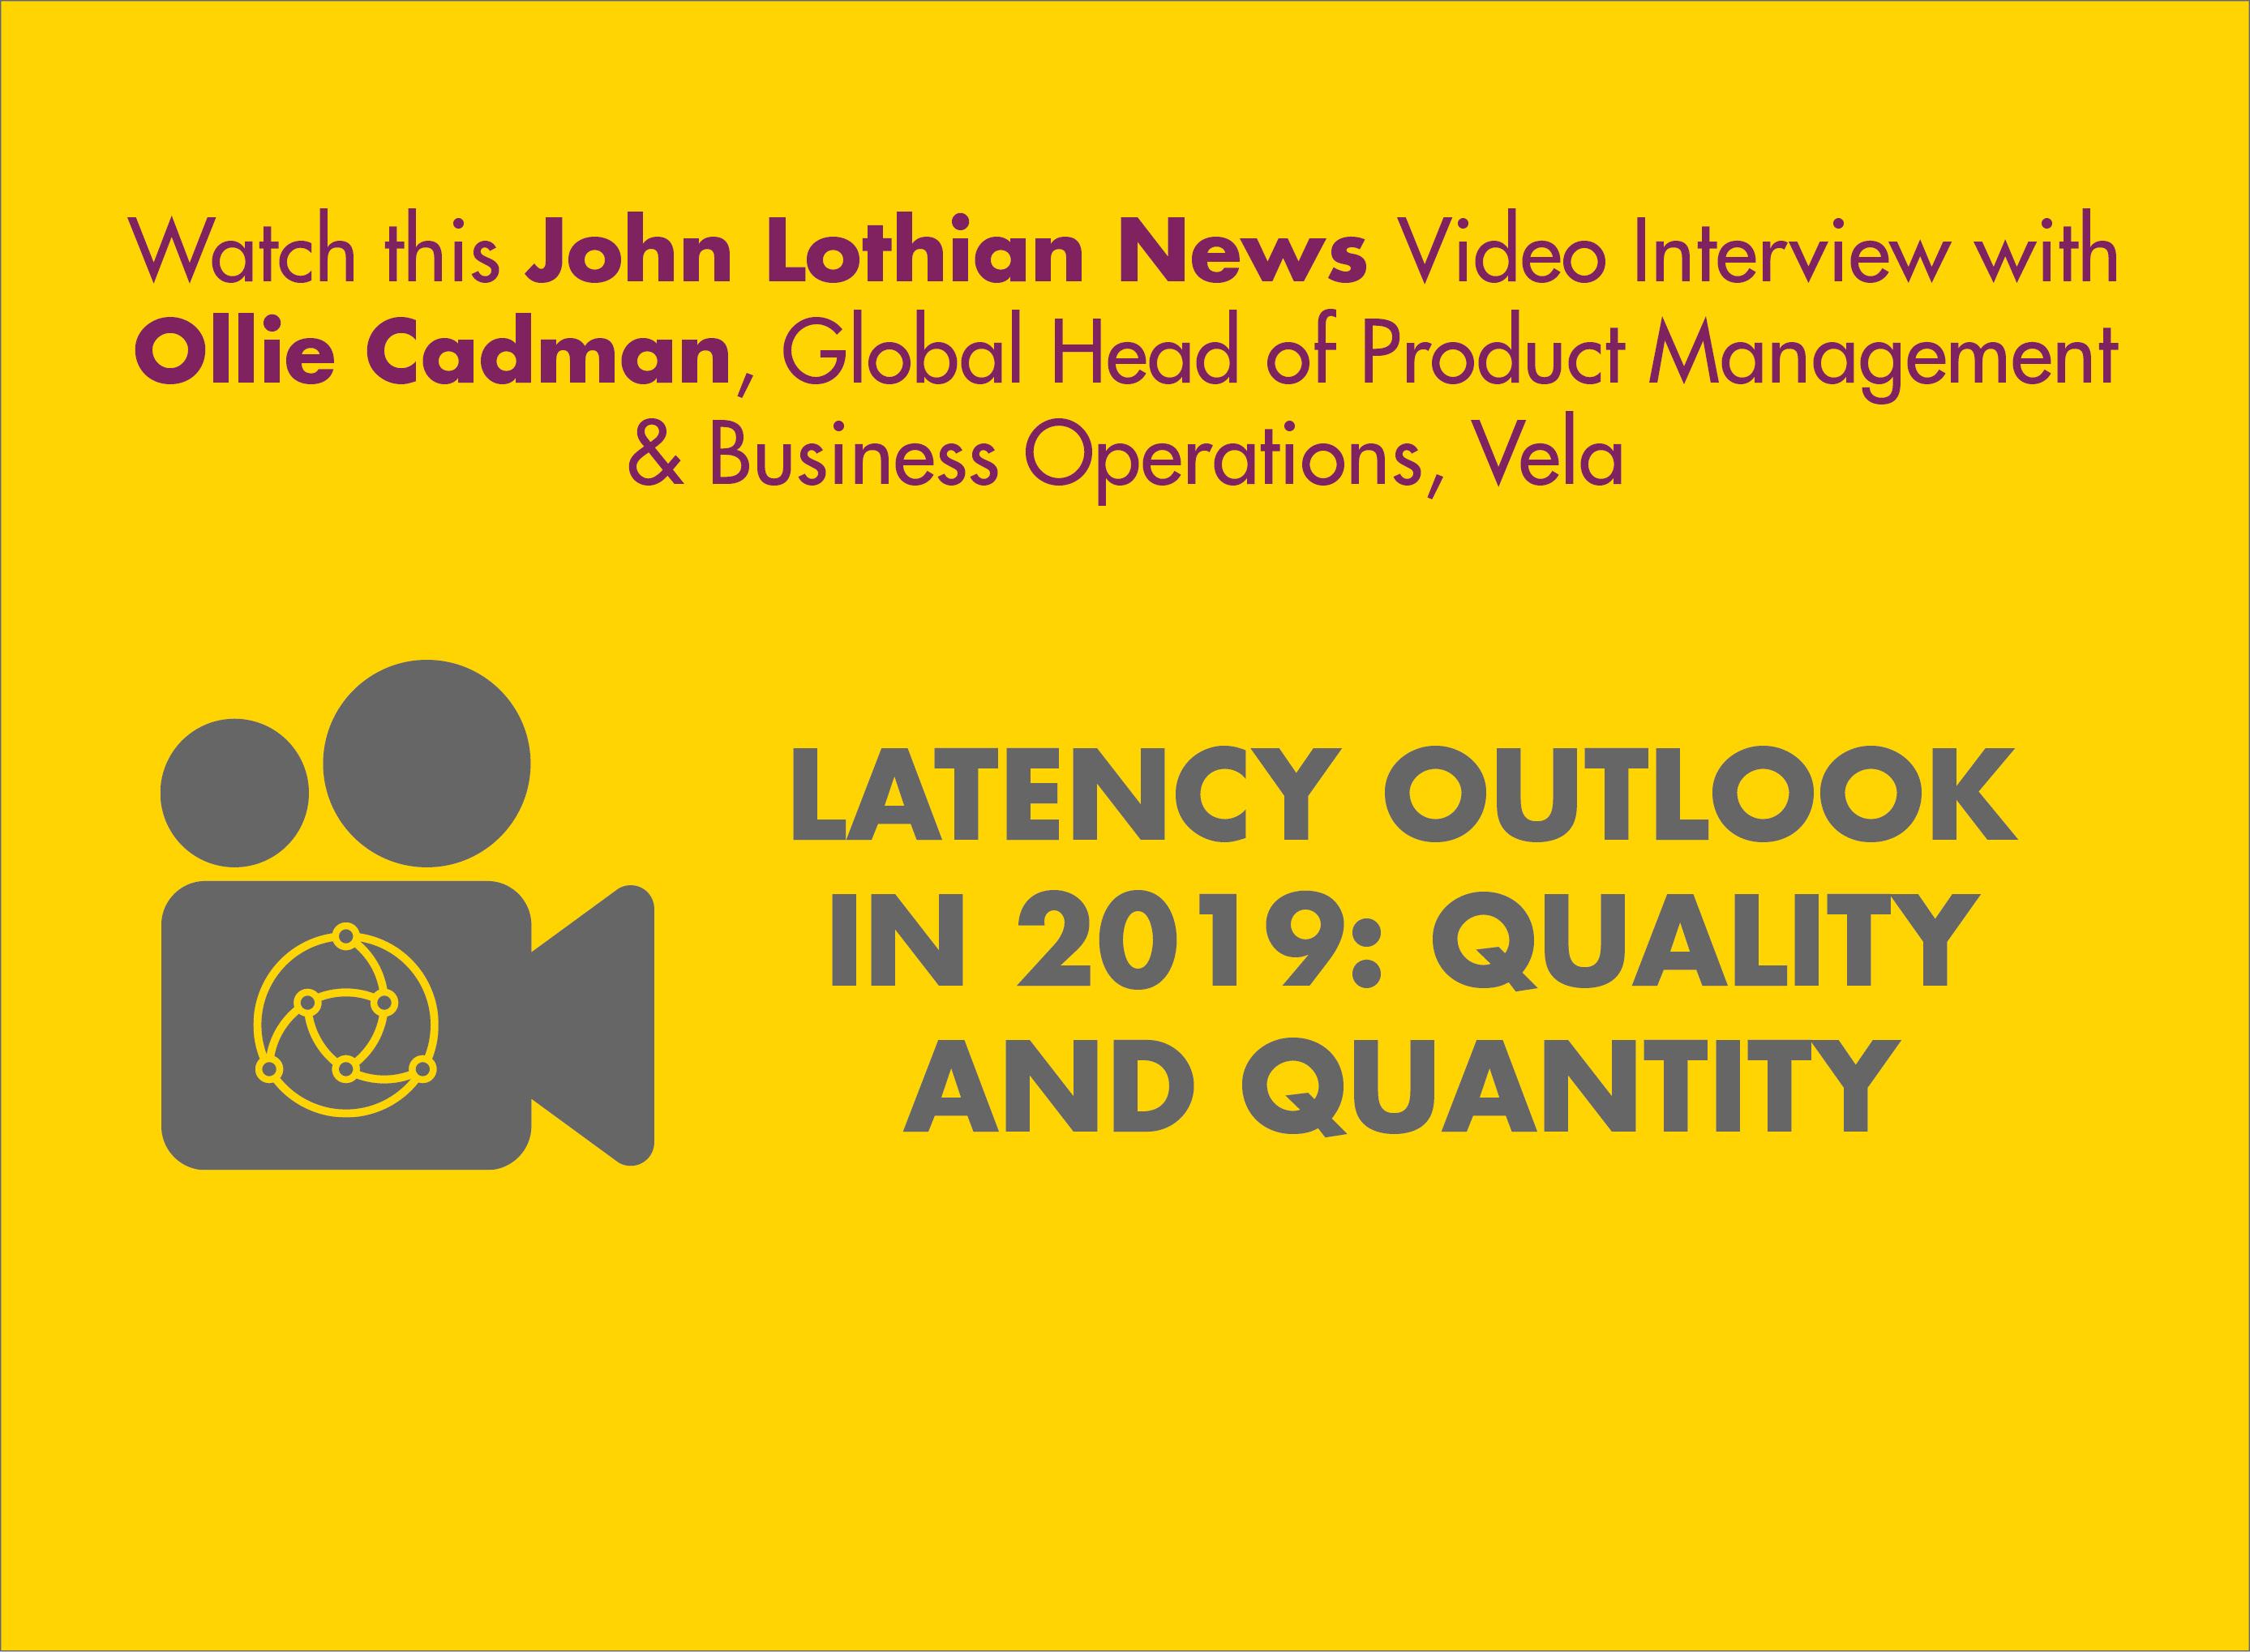 John Lothian News Video Interview with Ollie Cadman